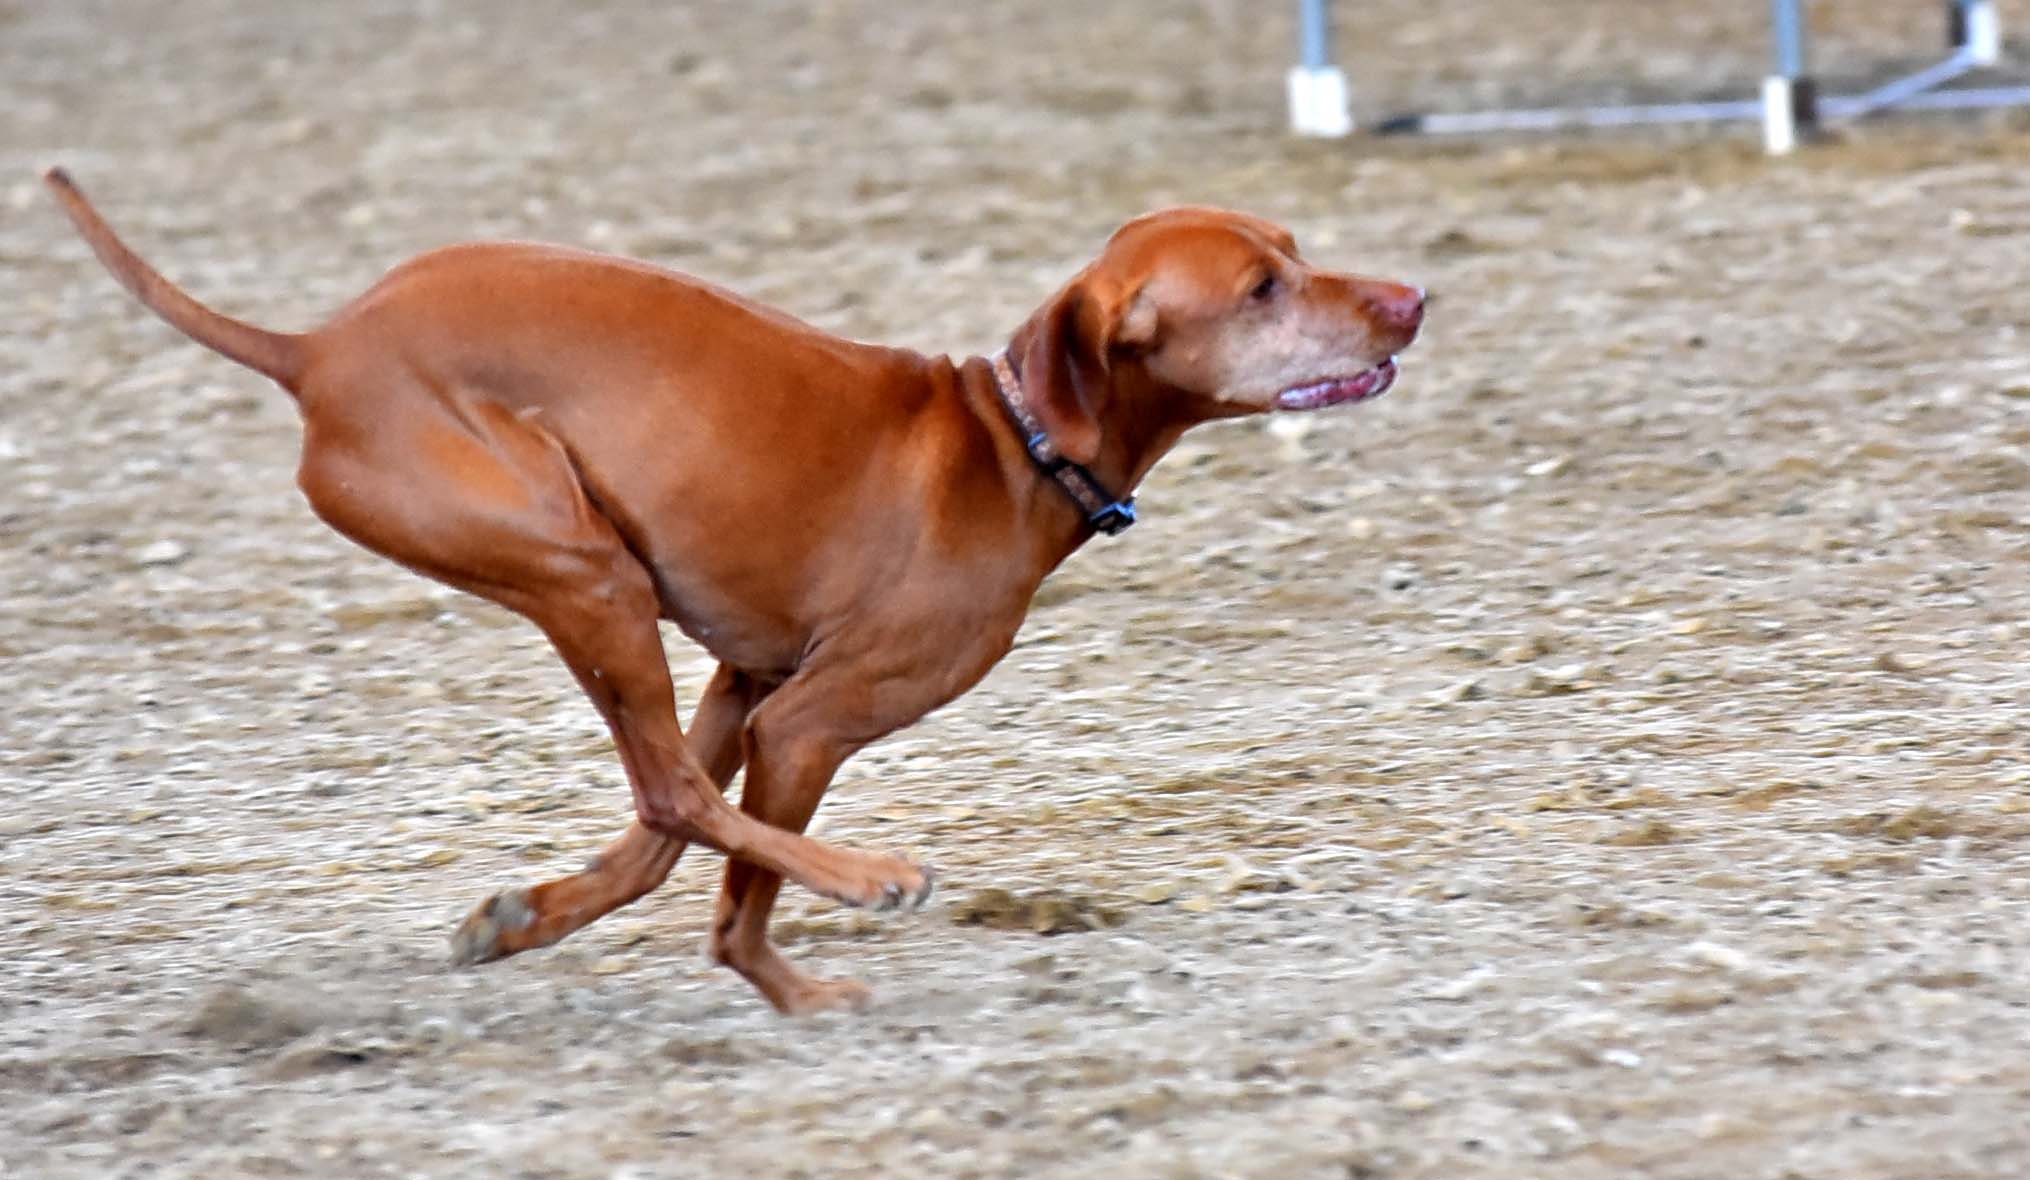 A Vizsla sprints through the agility course at the Sliver Bay Kennel Club Show. Vizslas can run up to 40 mph.